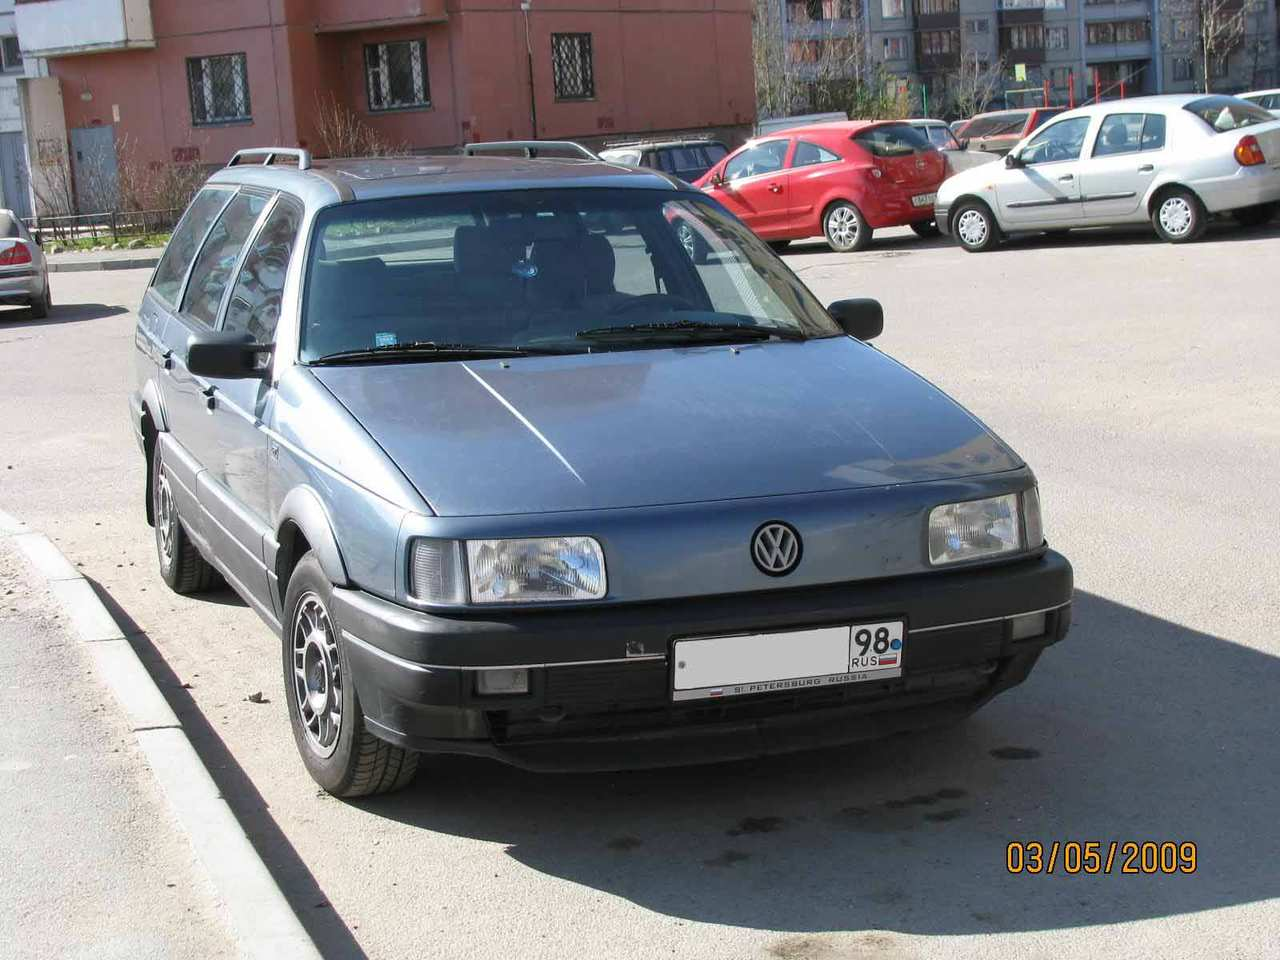 1989 Volkswagen Passat Pictures, 1800cc., Gasoline, FF, Manual For Sale